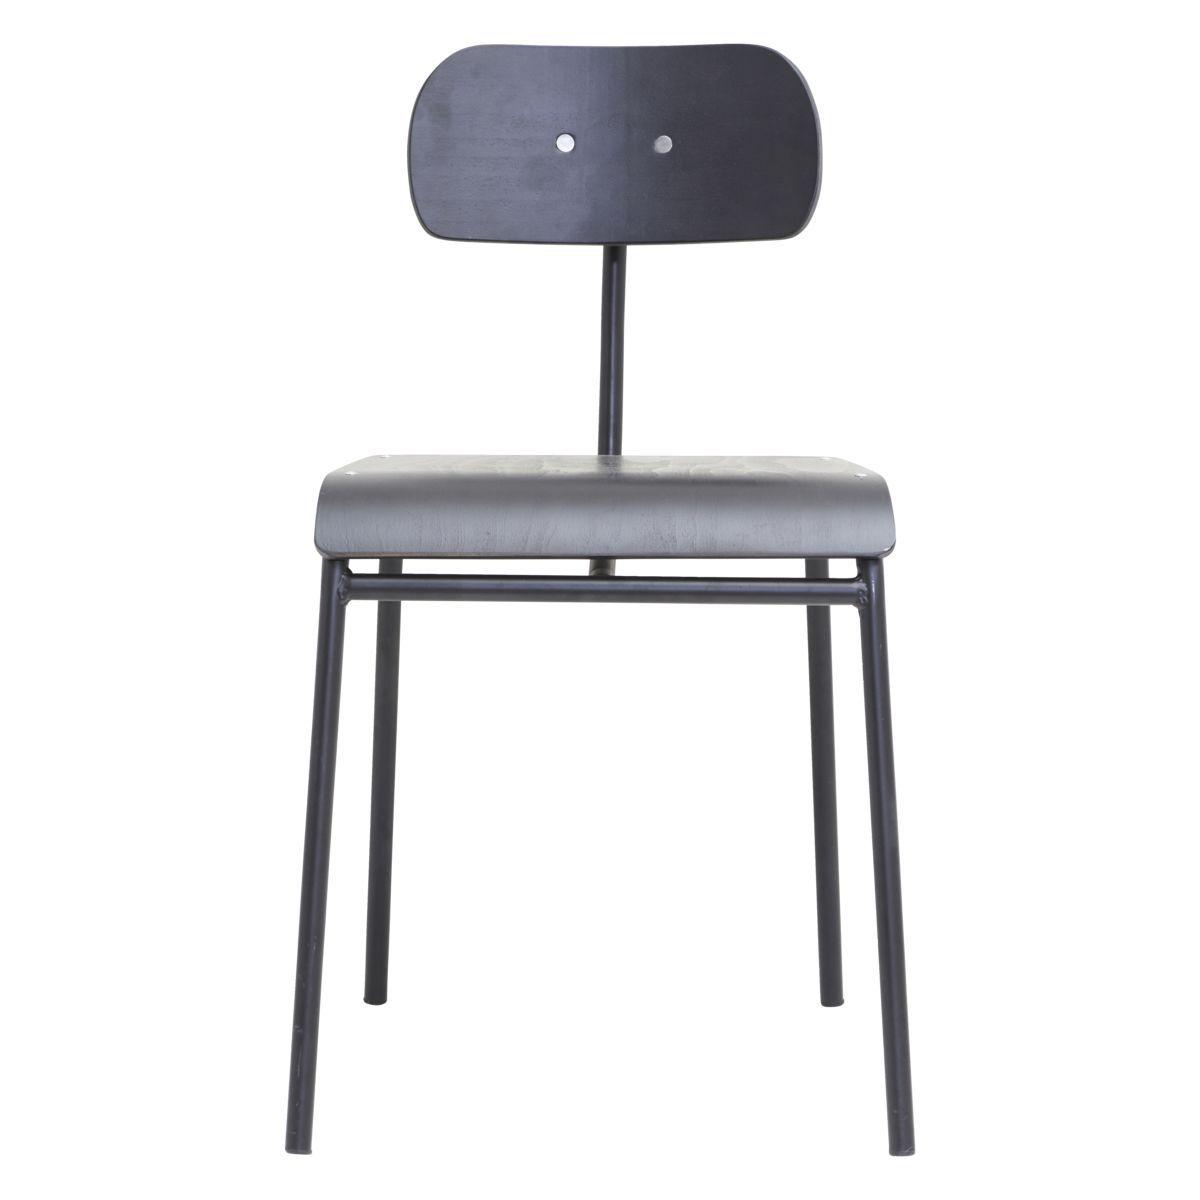 Dining Chair School Black Chairs Kitchen